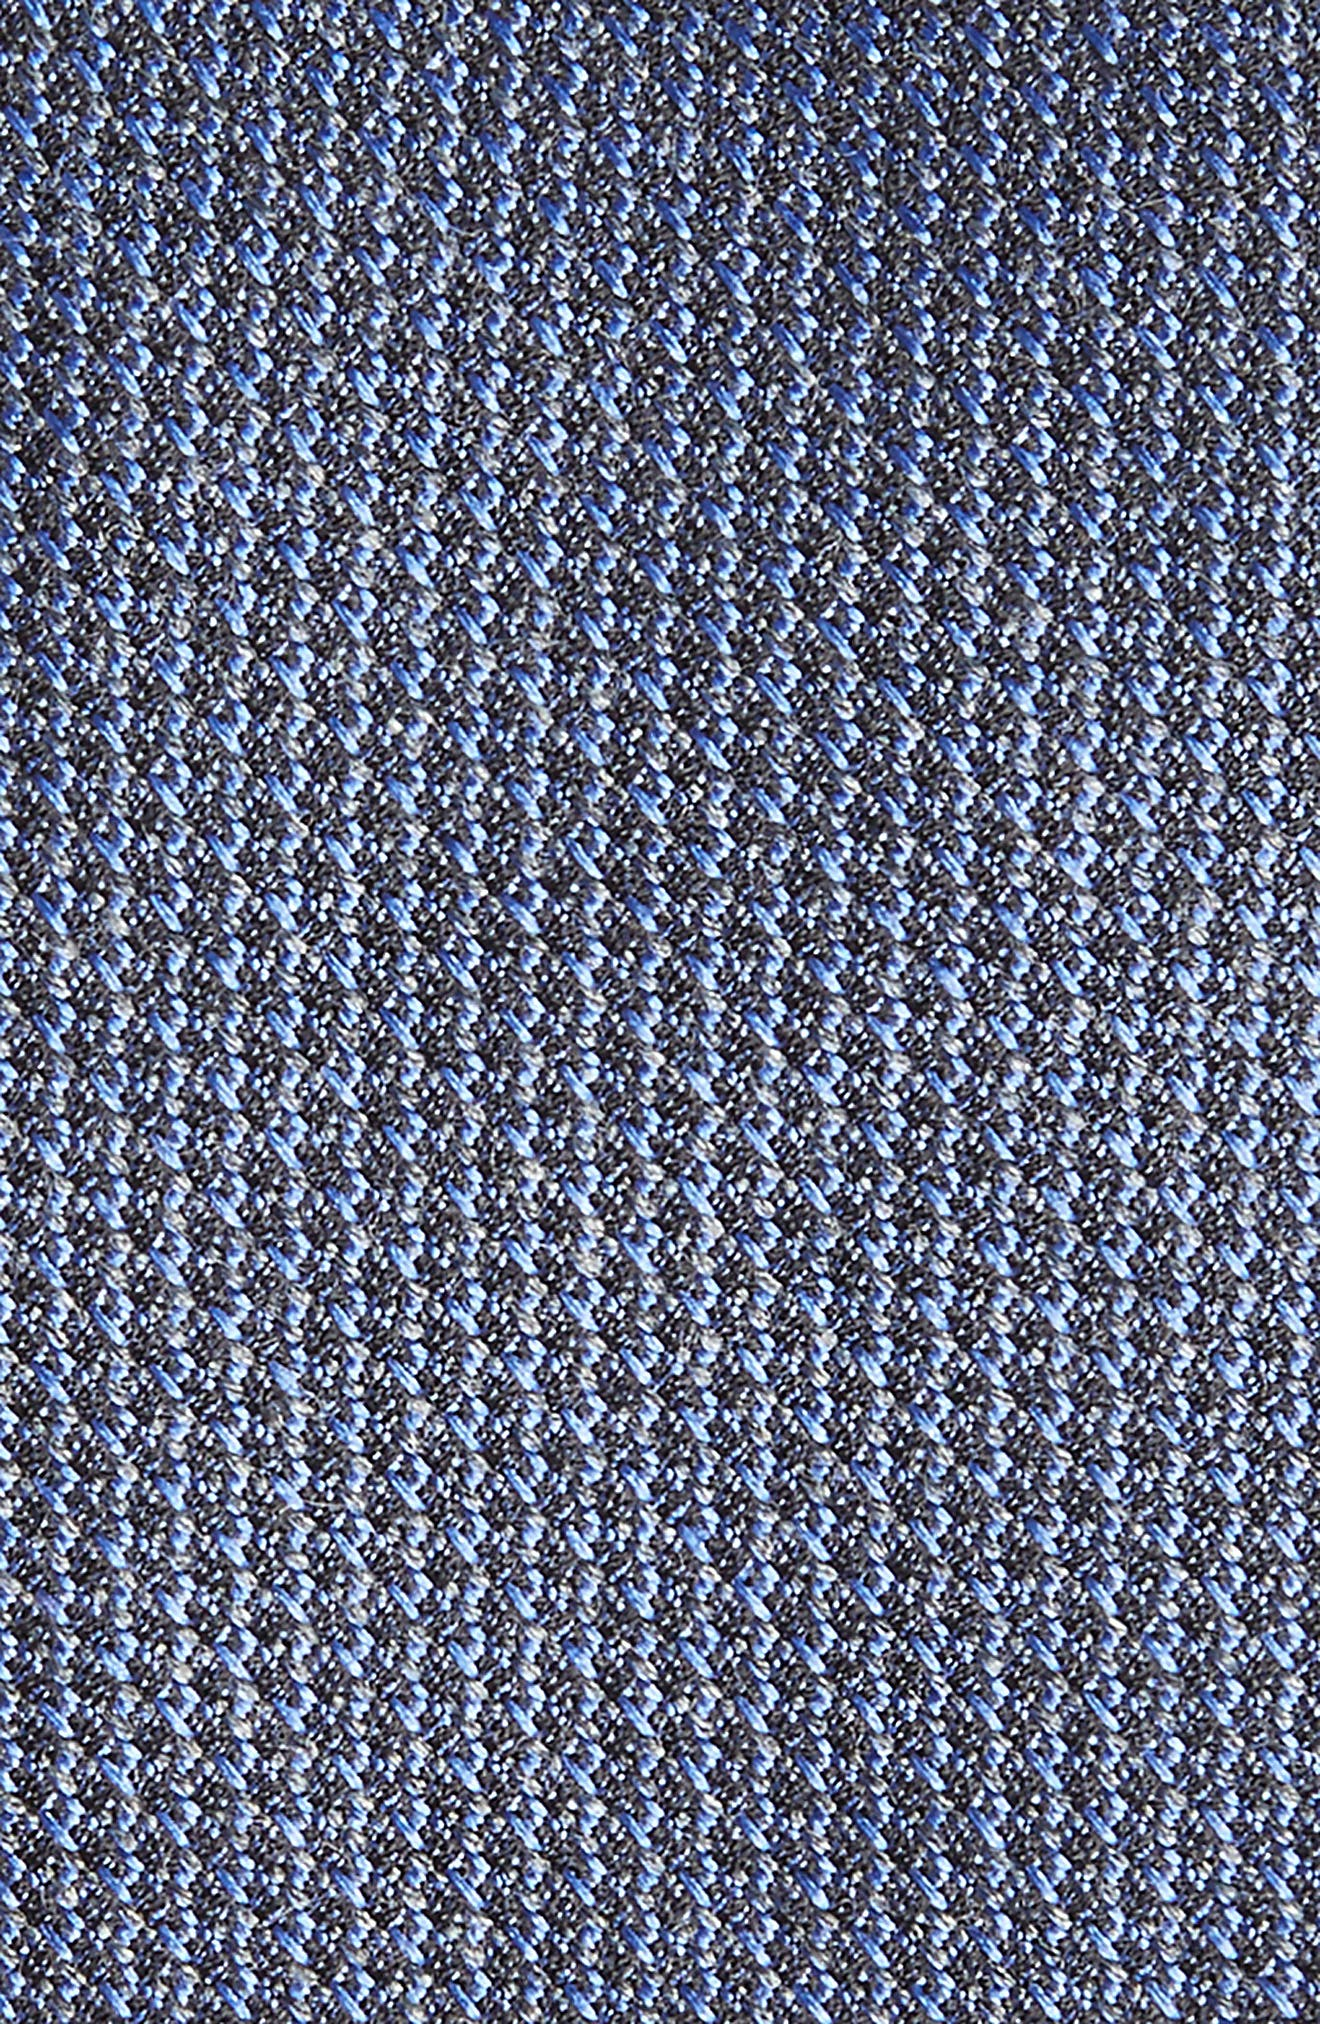 Kenton Textured Silk Blend Skinny Tie,                             Alternate thumbnail 8, color,